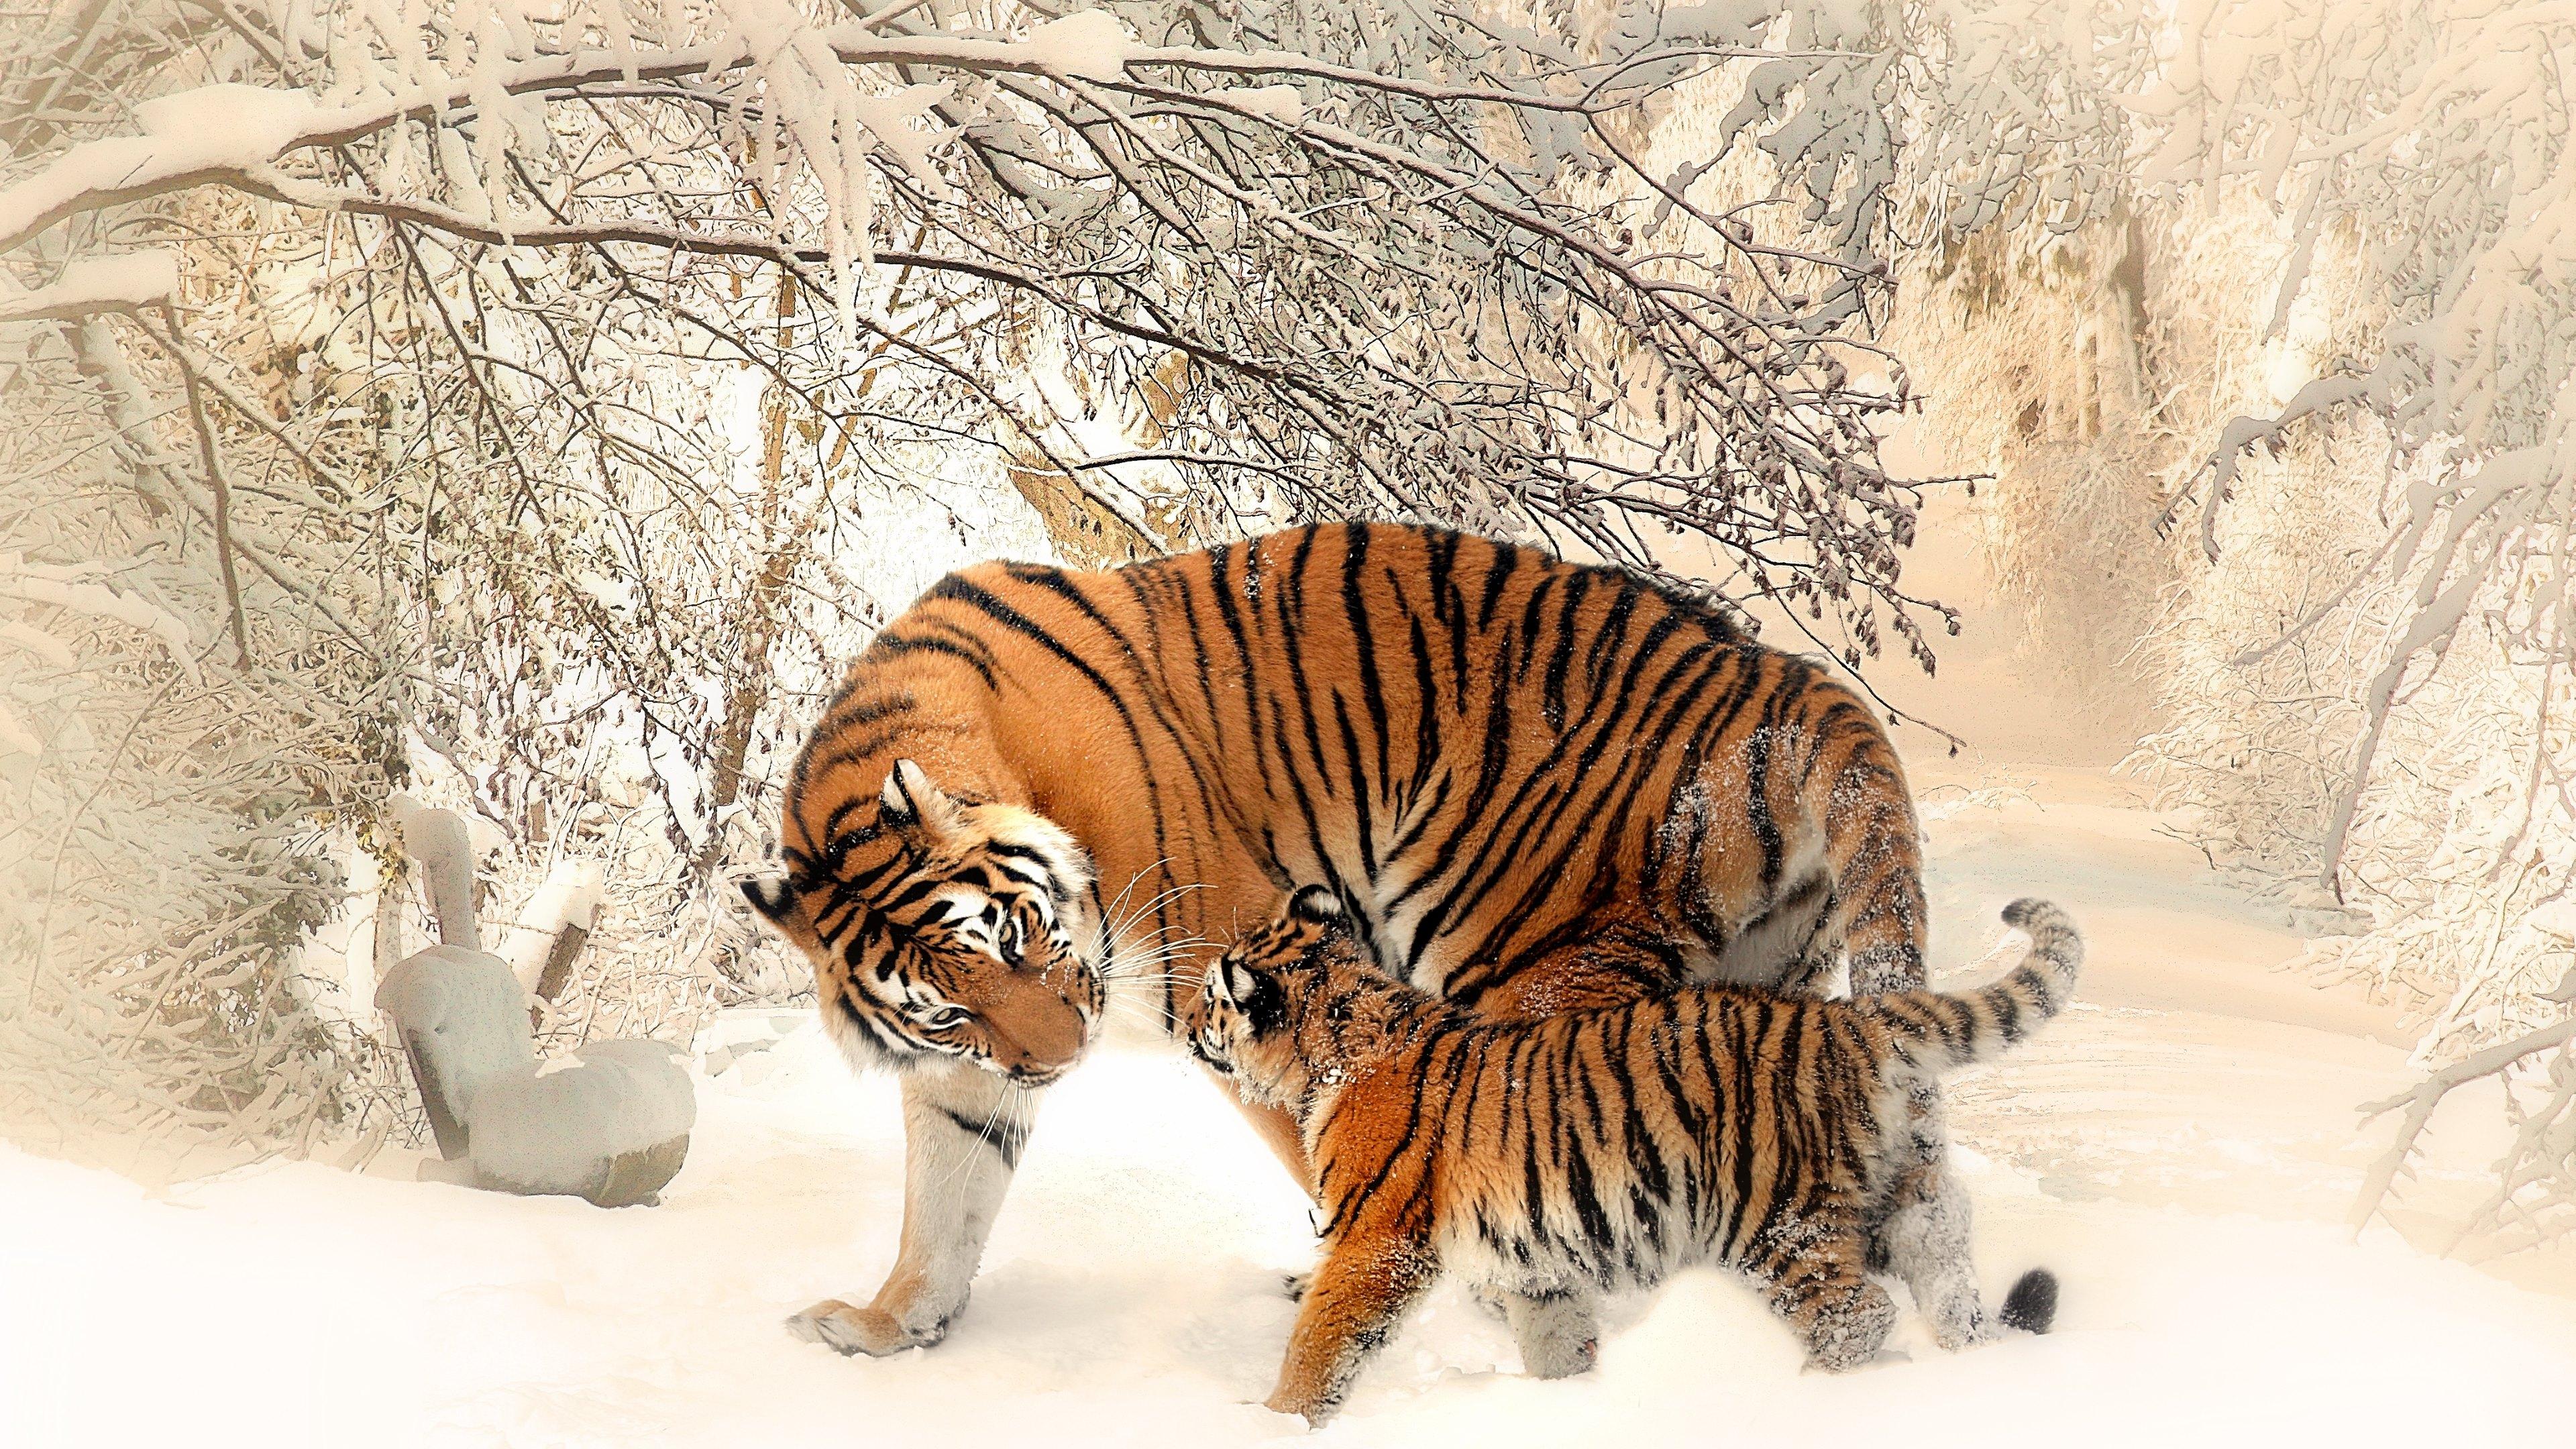 picalls | mother and cub tigerschristine sponchia.